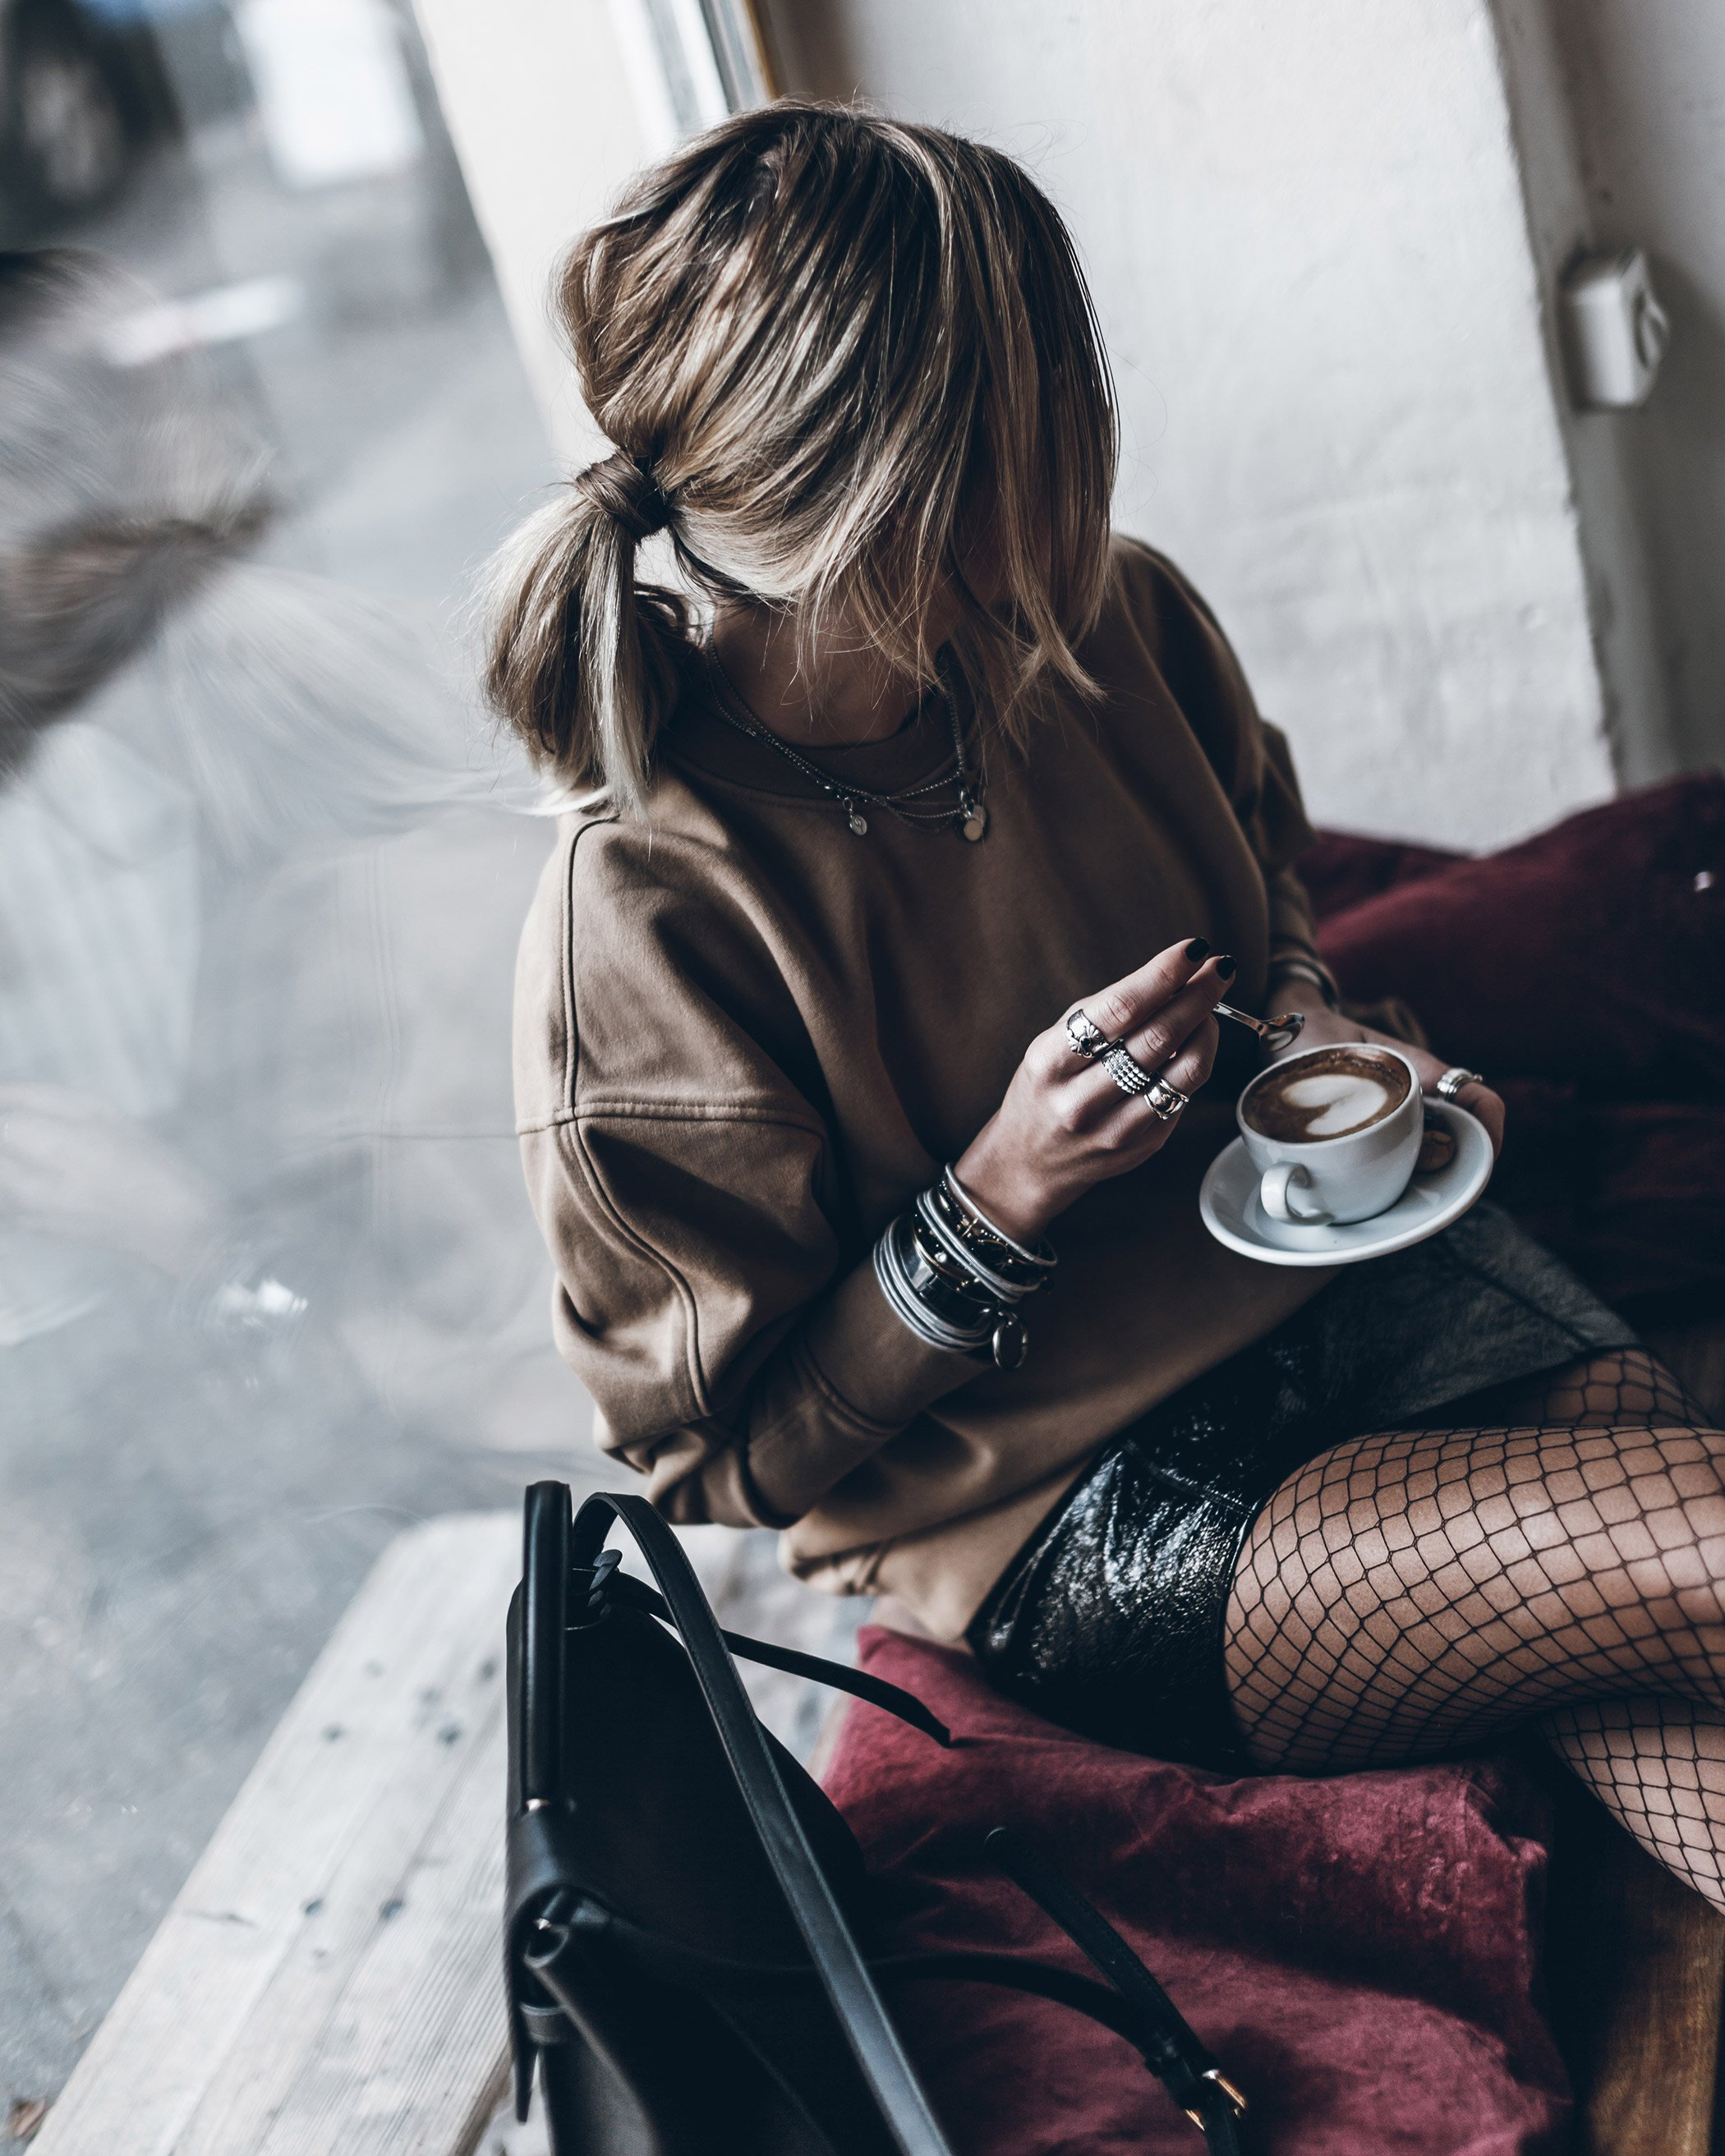 mikuta-patent-leather-skirt-15